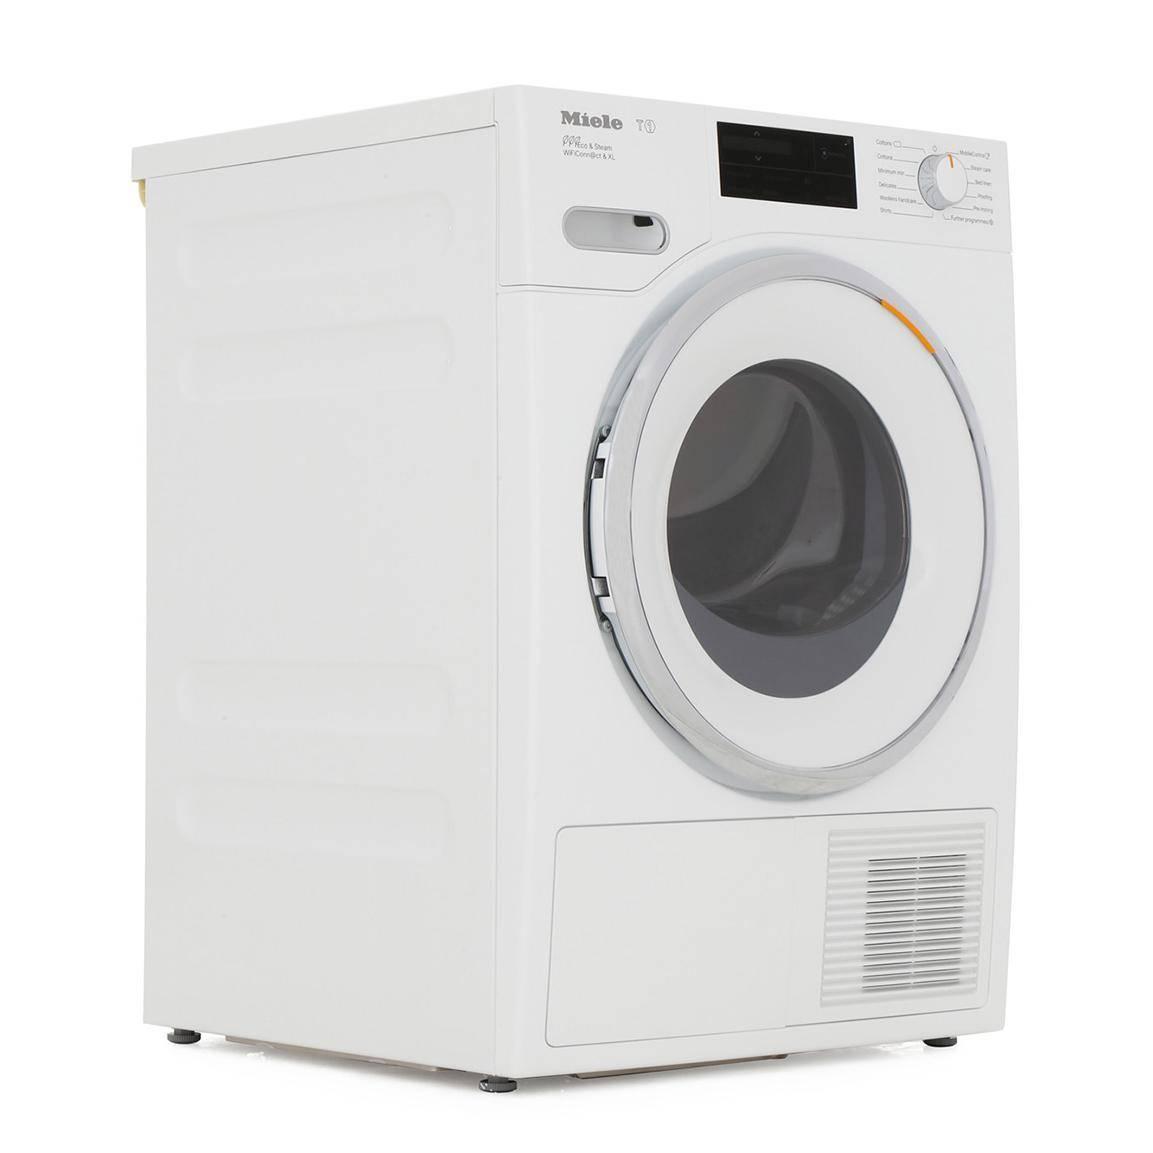 Miele Twj680wp 9kg Heat Pump Tumble Dryer With Steamfinish